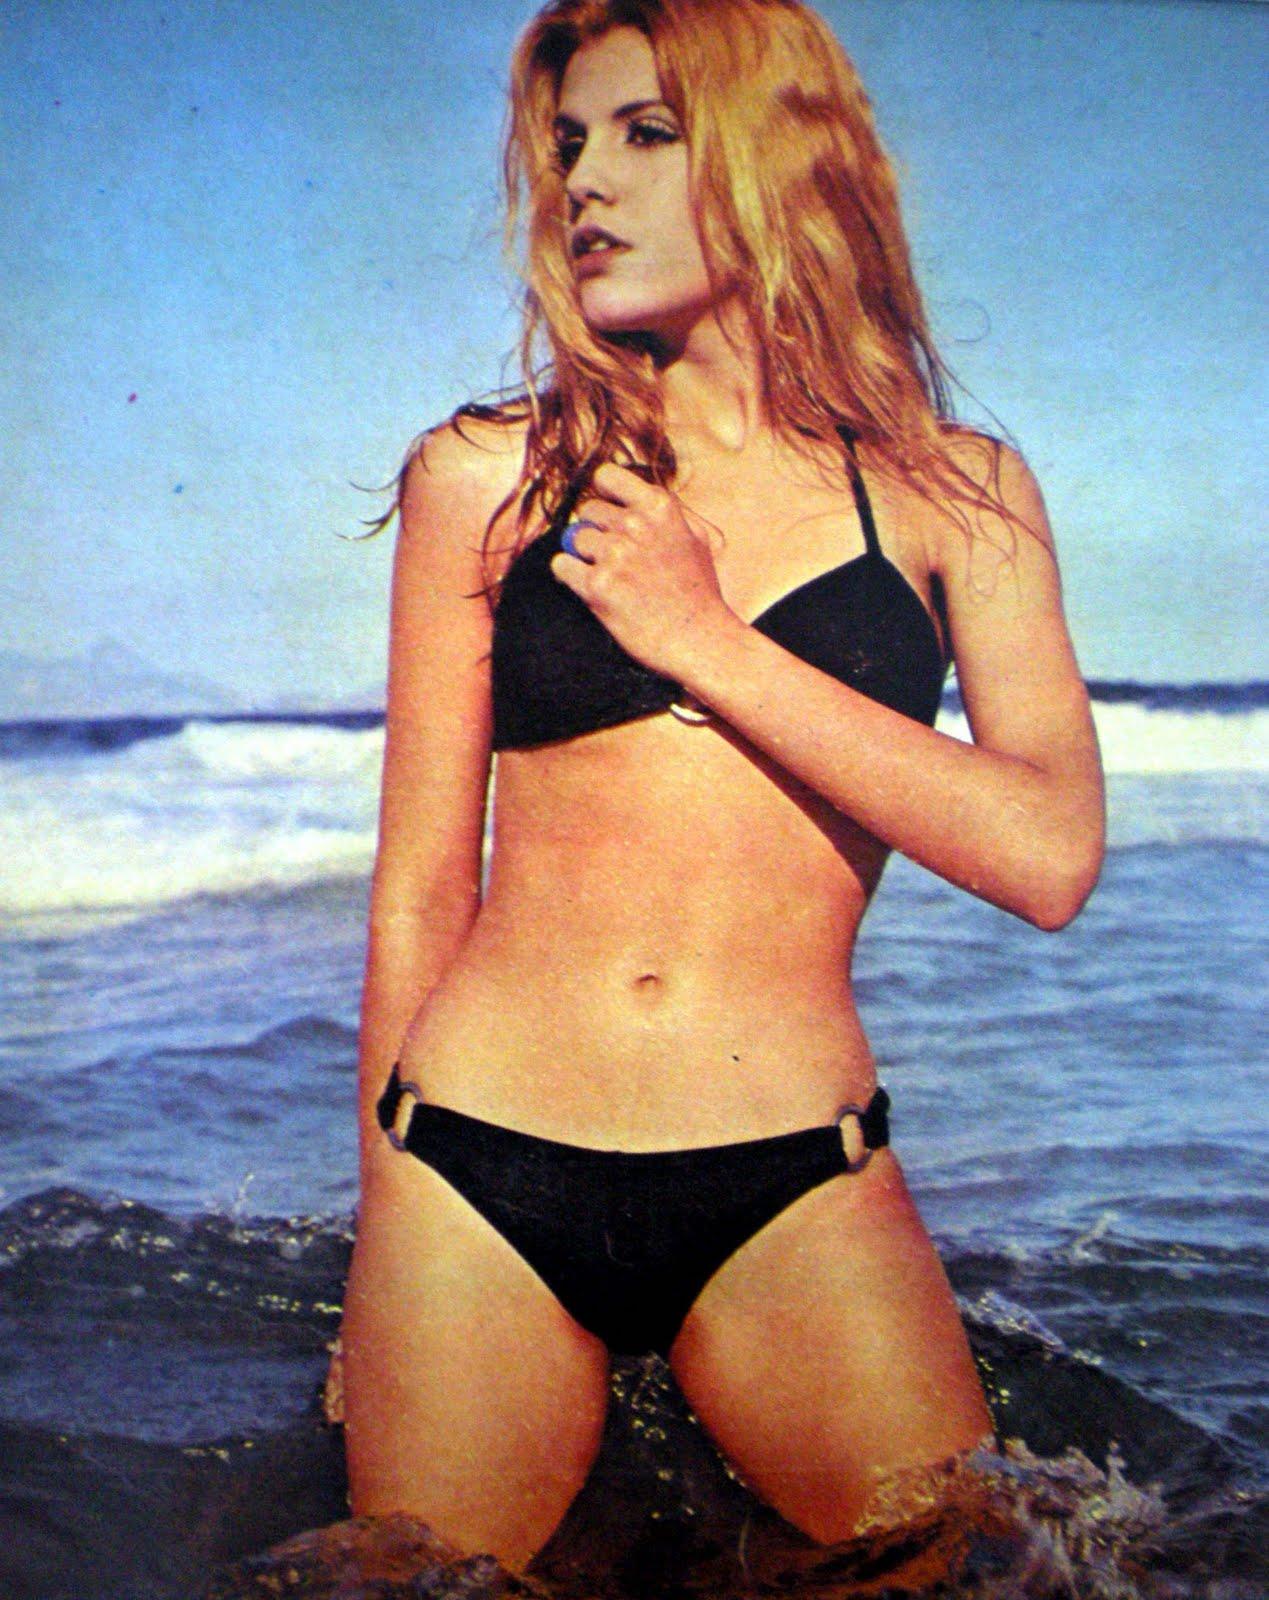 retro%2Bineditas%2B1150 She was a brazilian sex symbol durin' the 70's. A TV and cinema actress, ...